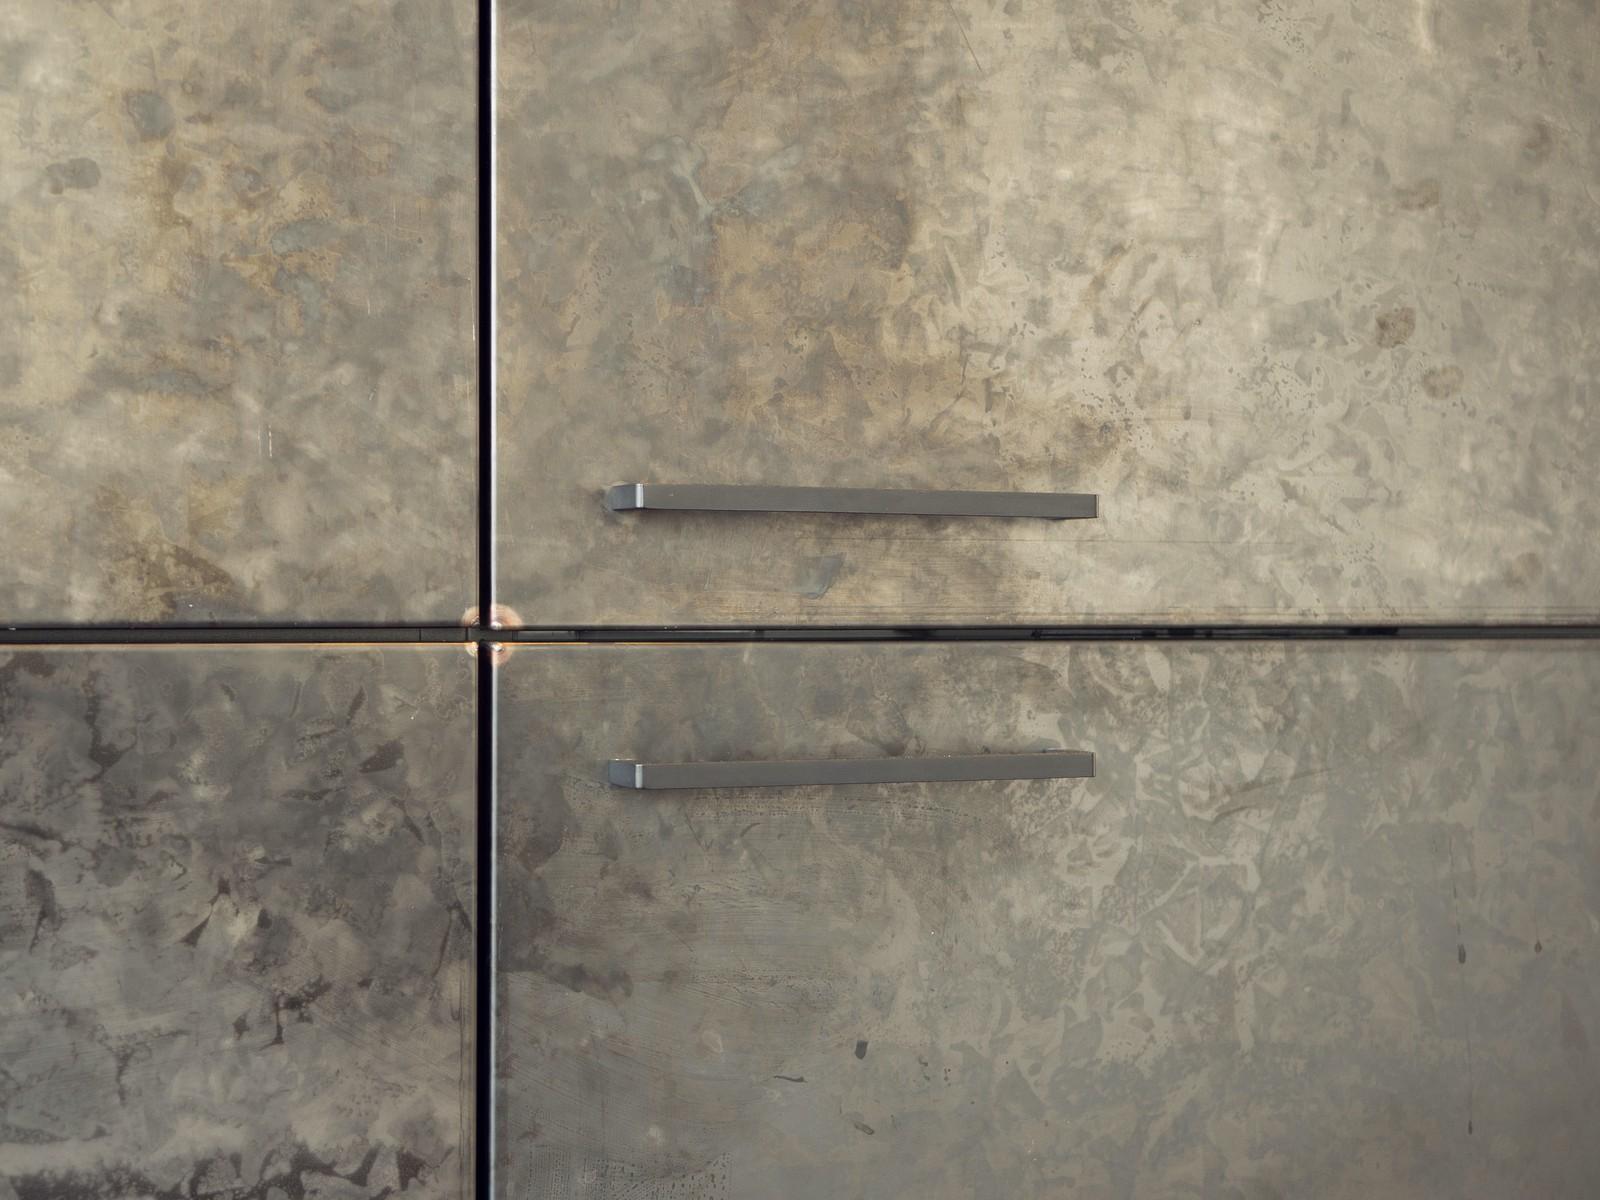 Kueche Exklusiv Design Fronten Holz Furnier Sonnenverbrannt Stahl Keramik Arbeitsplatte Miele 33